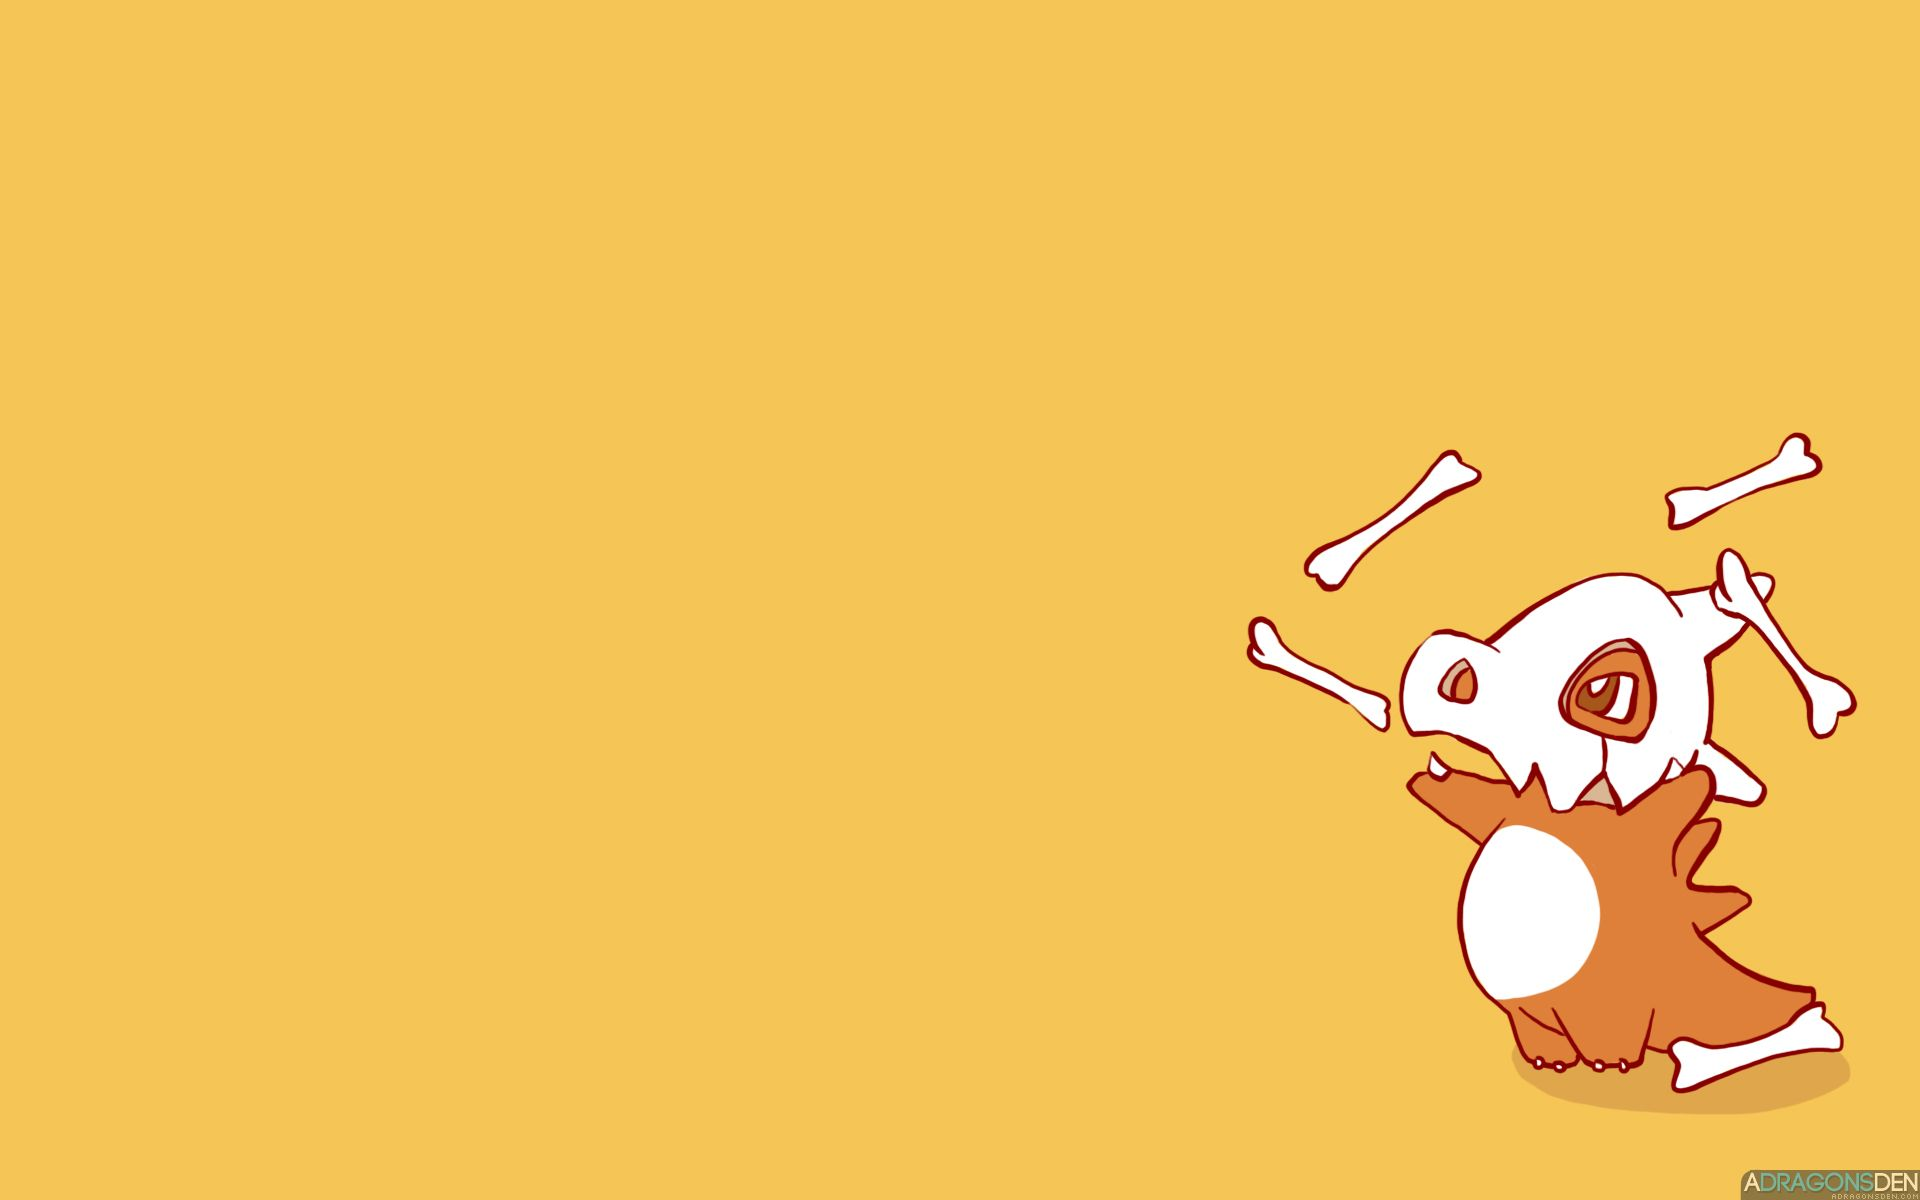 Pokemon Wallpaper Cubone By Lvstarlitsky On Deviantart Android Wallpaper Anime Cute Anime Wallpaper Anime Wallpaper